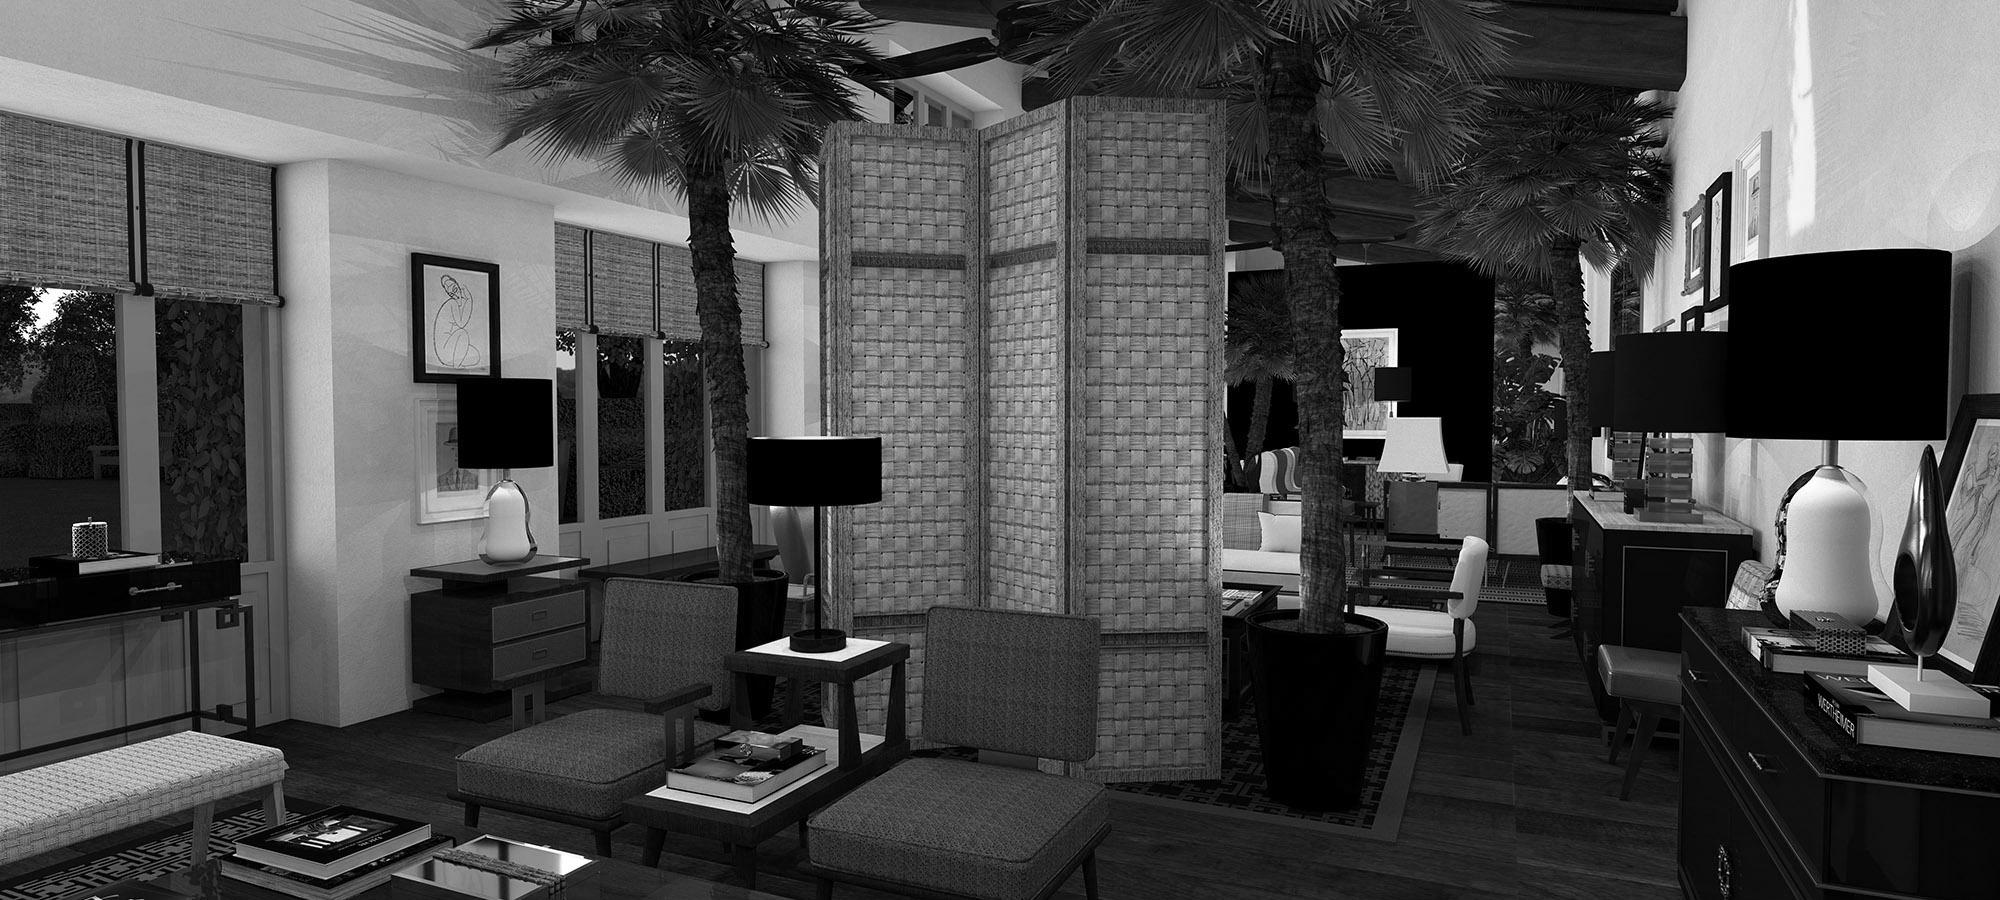 michele-bonan-interiors-showroom-4-bw-1